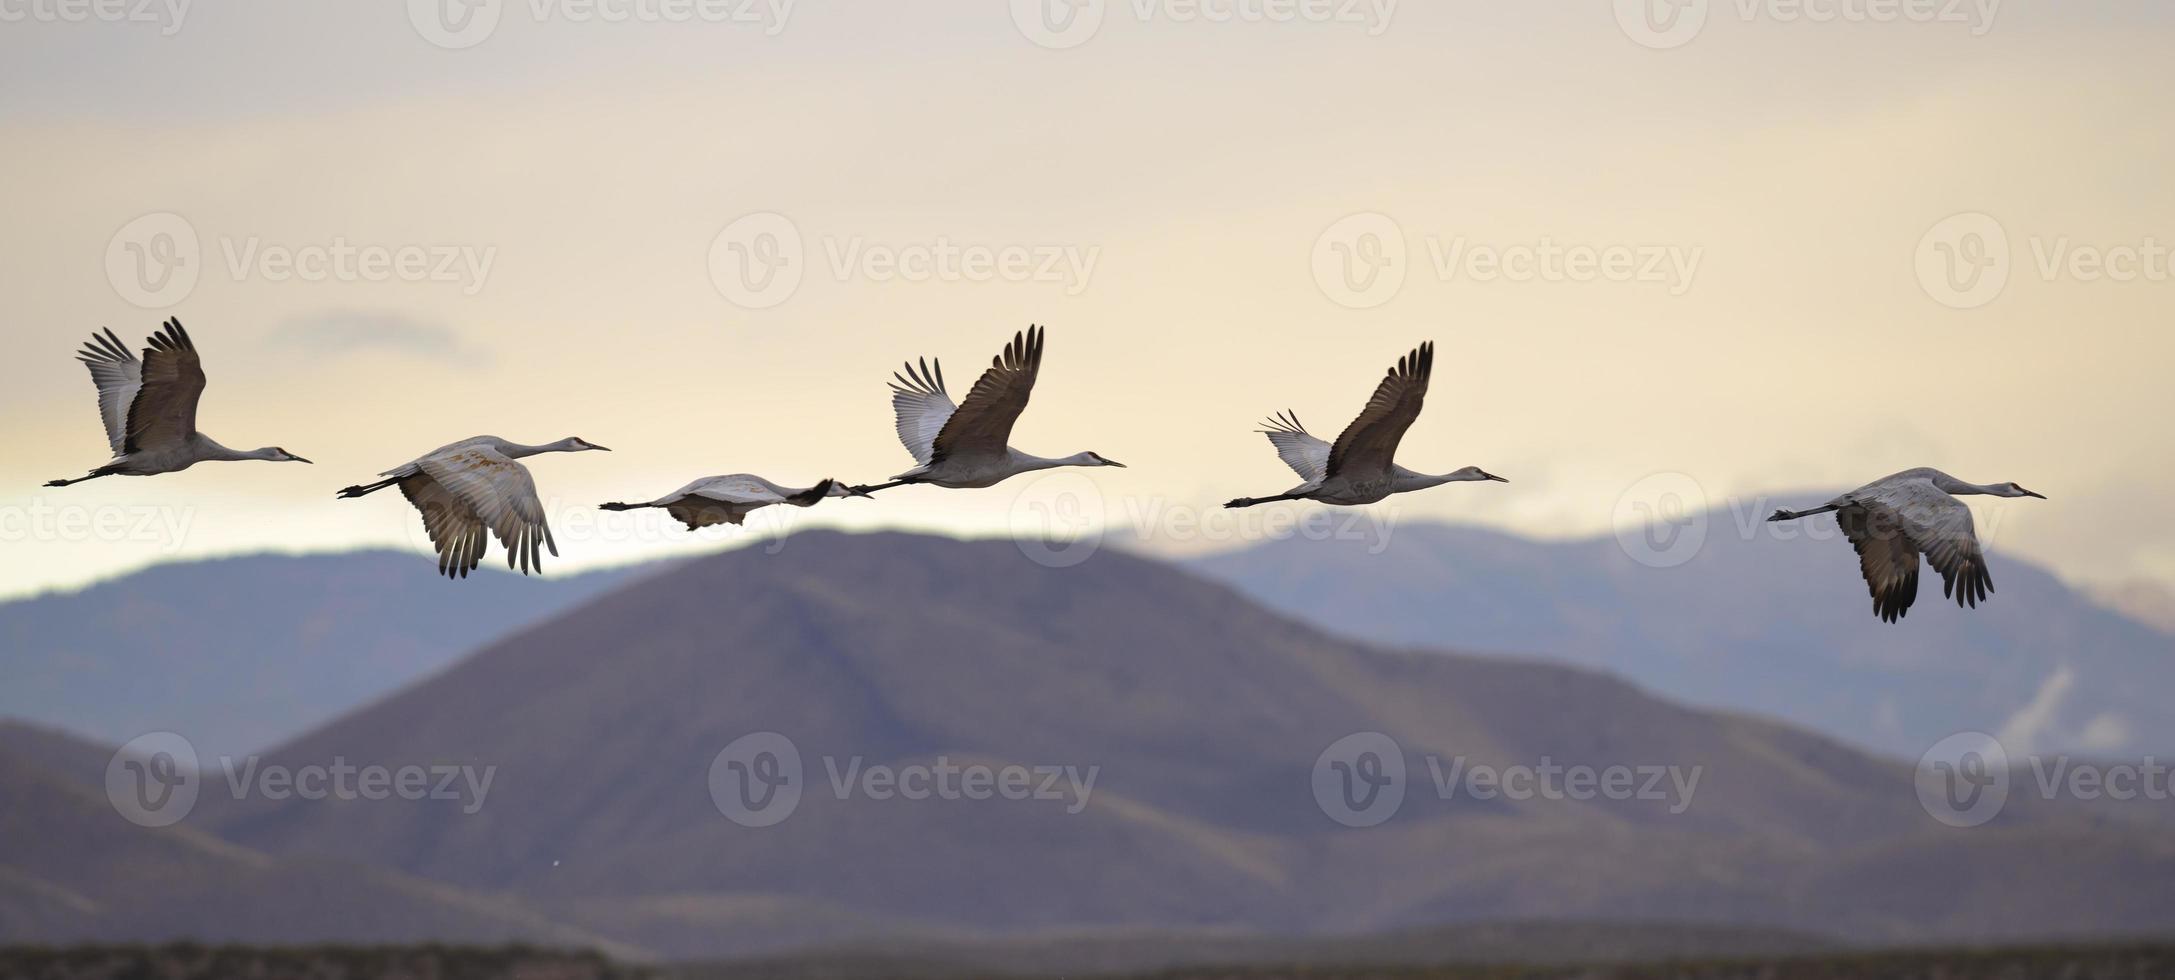 Flying cranes photo